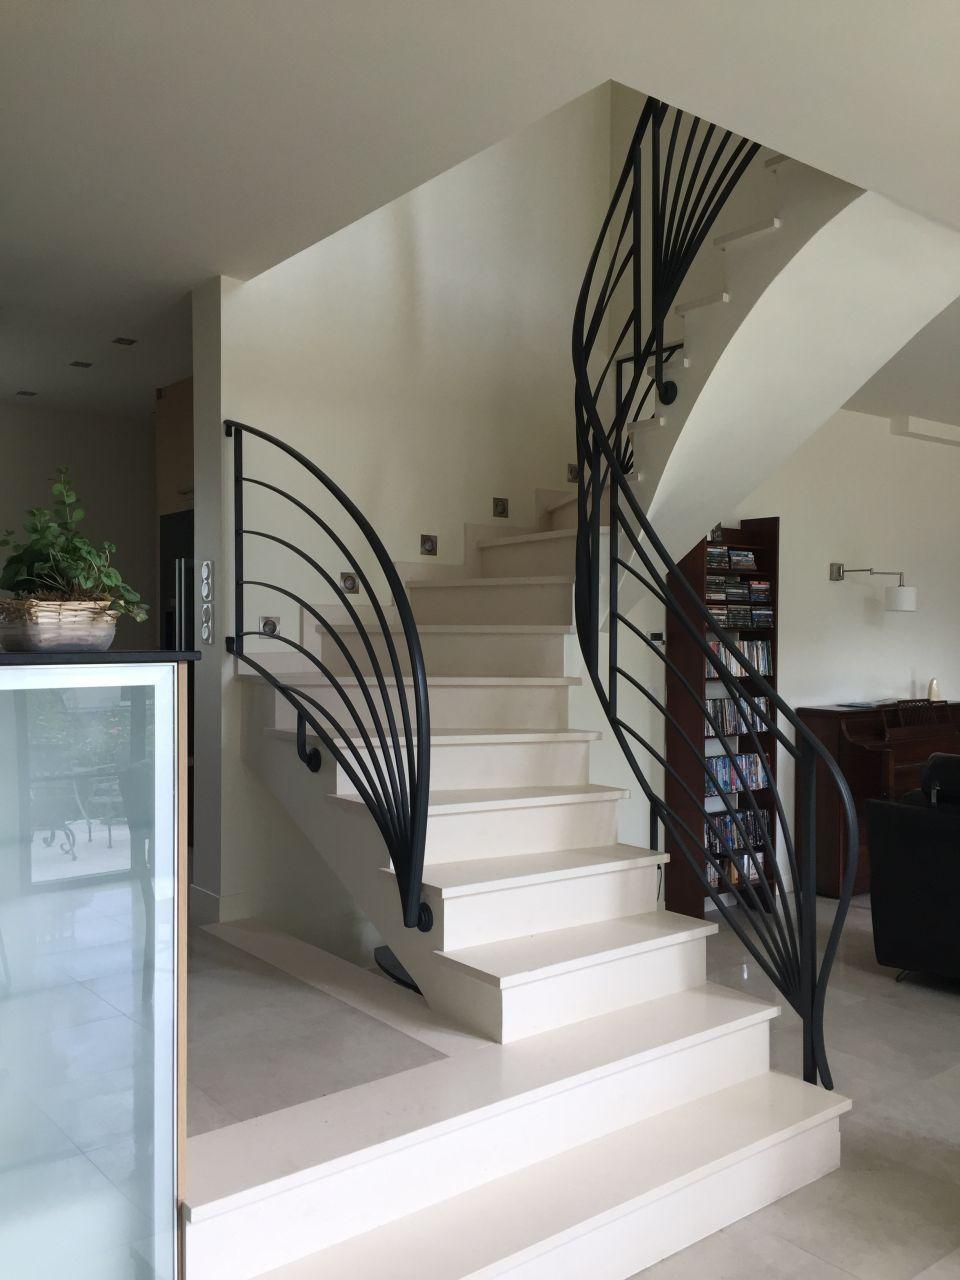 l 39 escalier en voute sarrasine et sa rampe en fer forg hand rails staircase railings stair. Black Bedroom Furniture Sets. Home Design Ideas